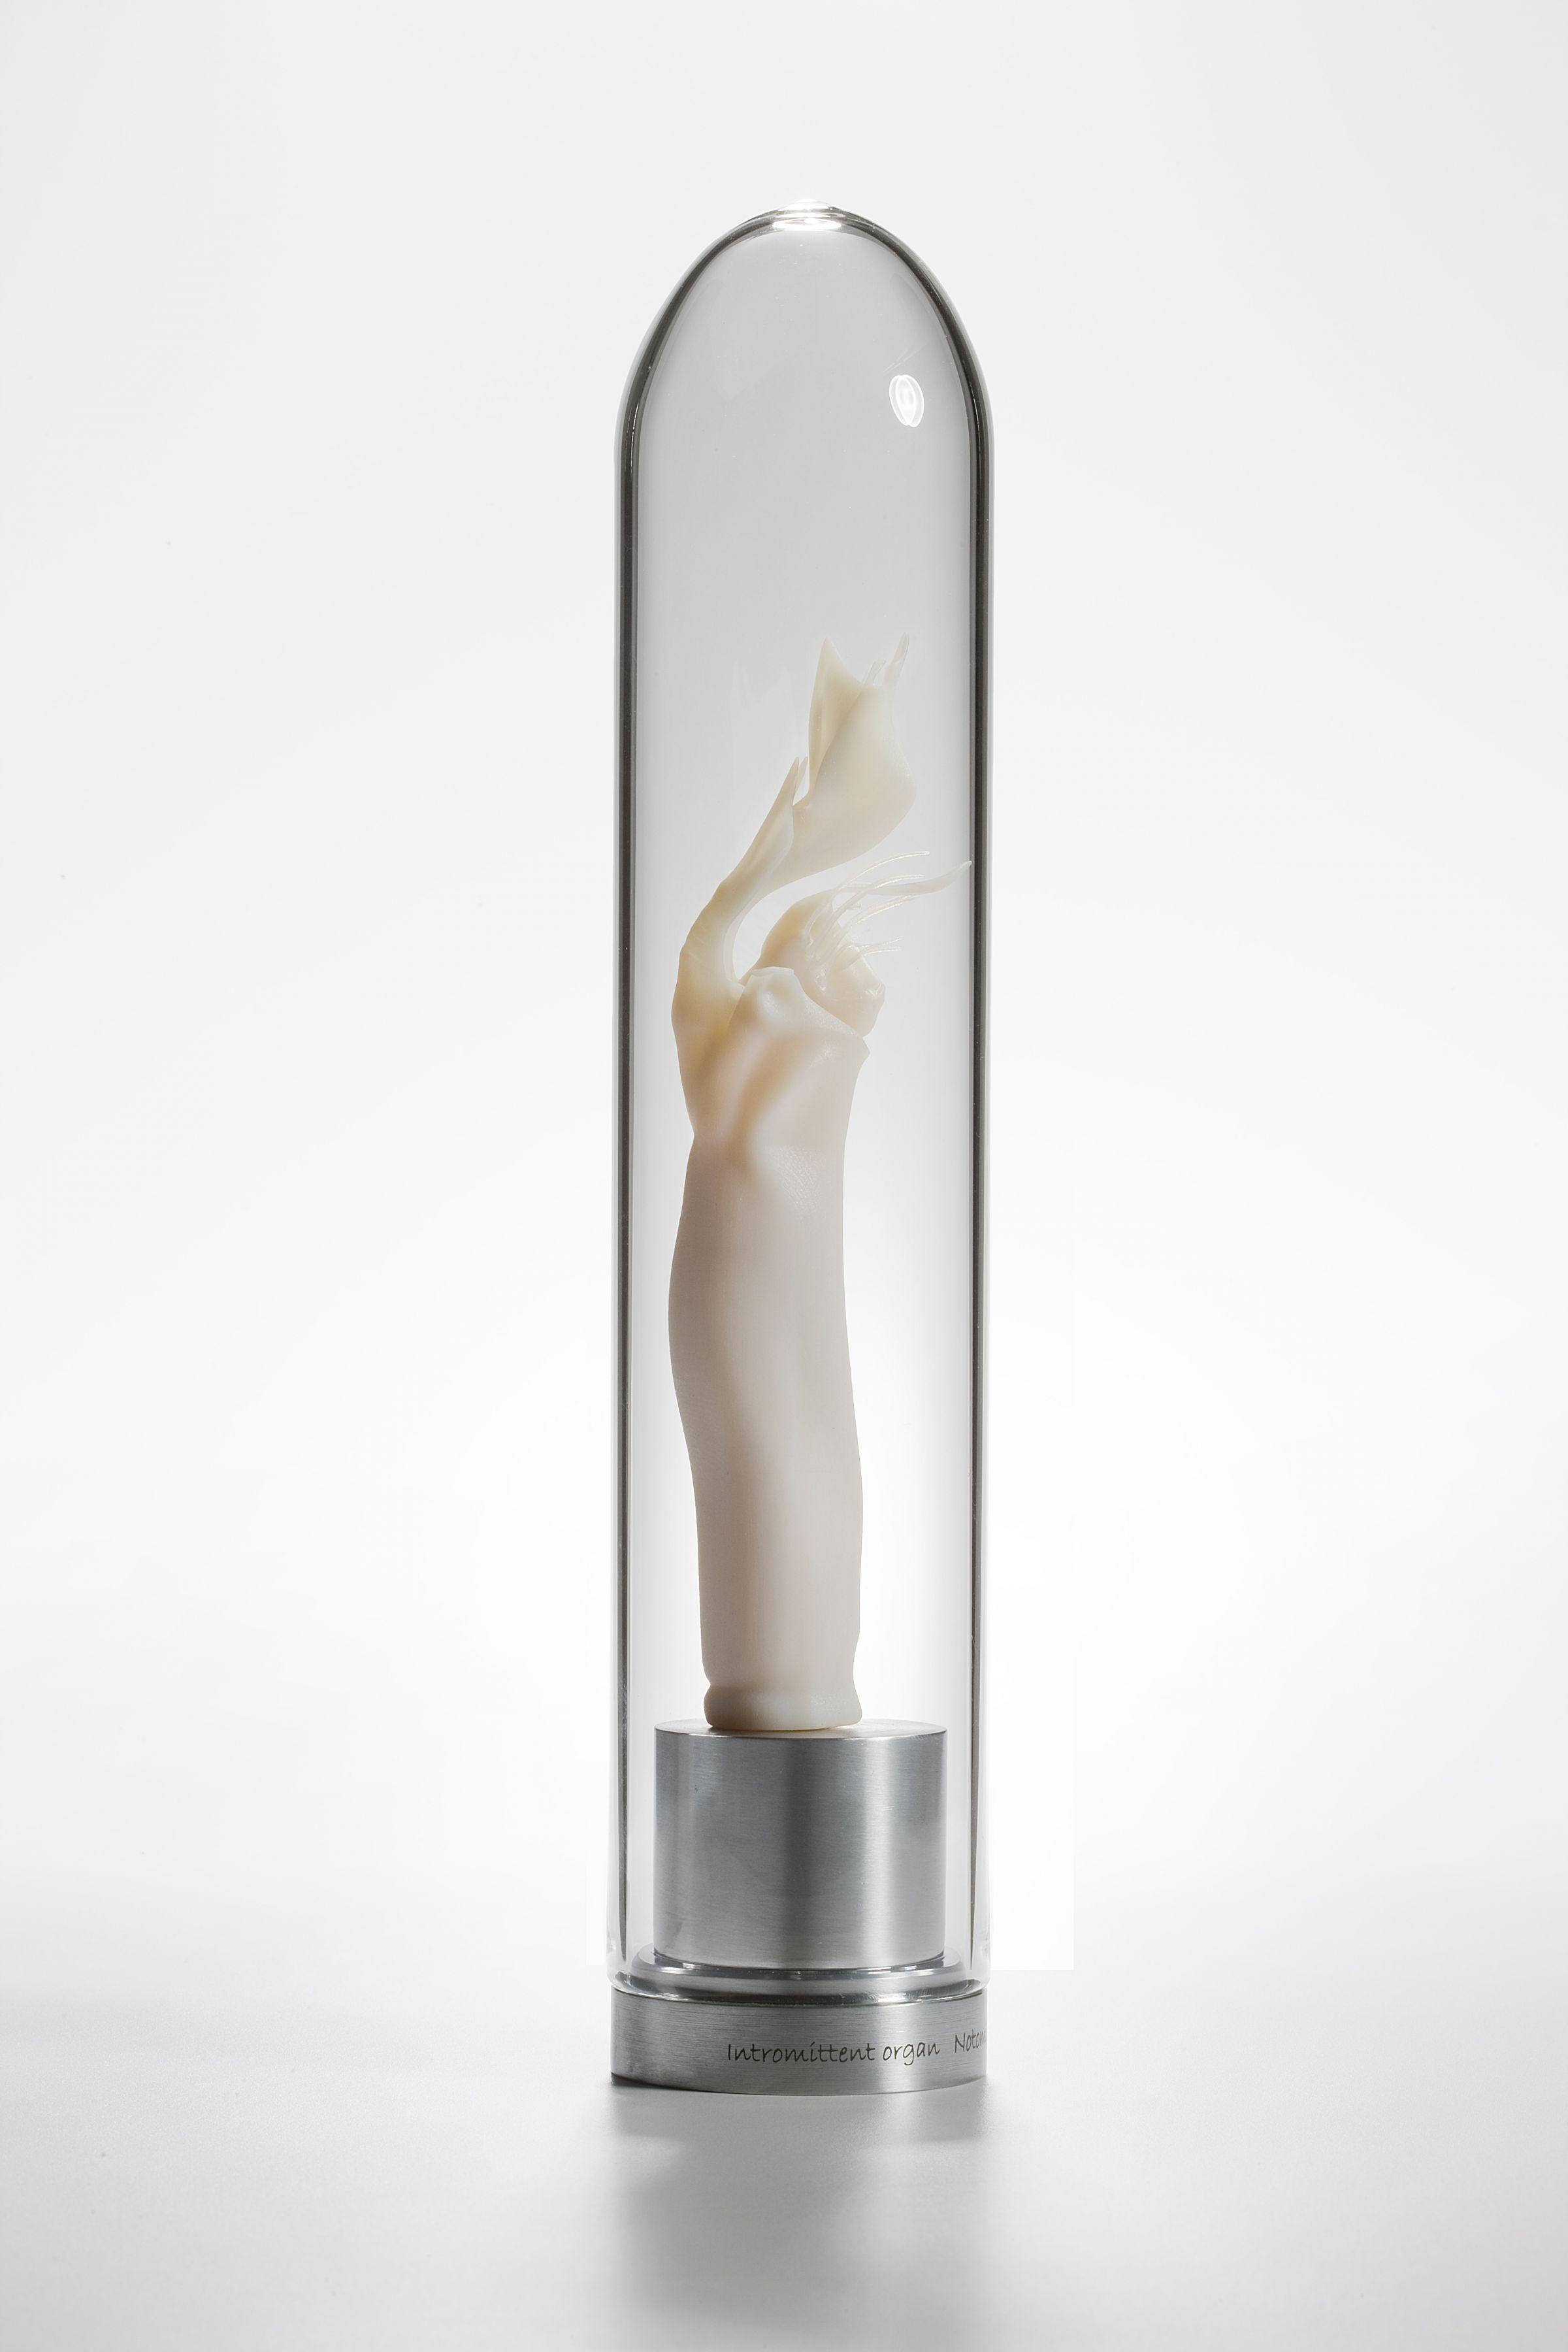 Maria Fernanda Cardoso,Intromittent organ of Thelbunus sp harvestman, 2008-2009,Resin, glass, metal,11 x 2 3/8 x 2 3/8 in. (27.9 x 6 x 6 cm.)